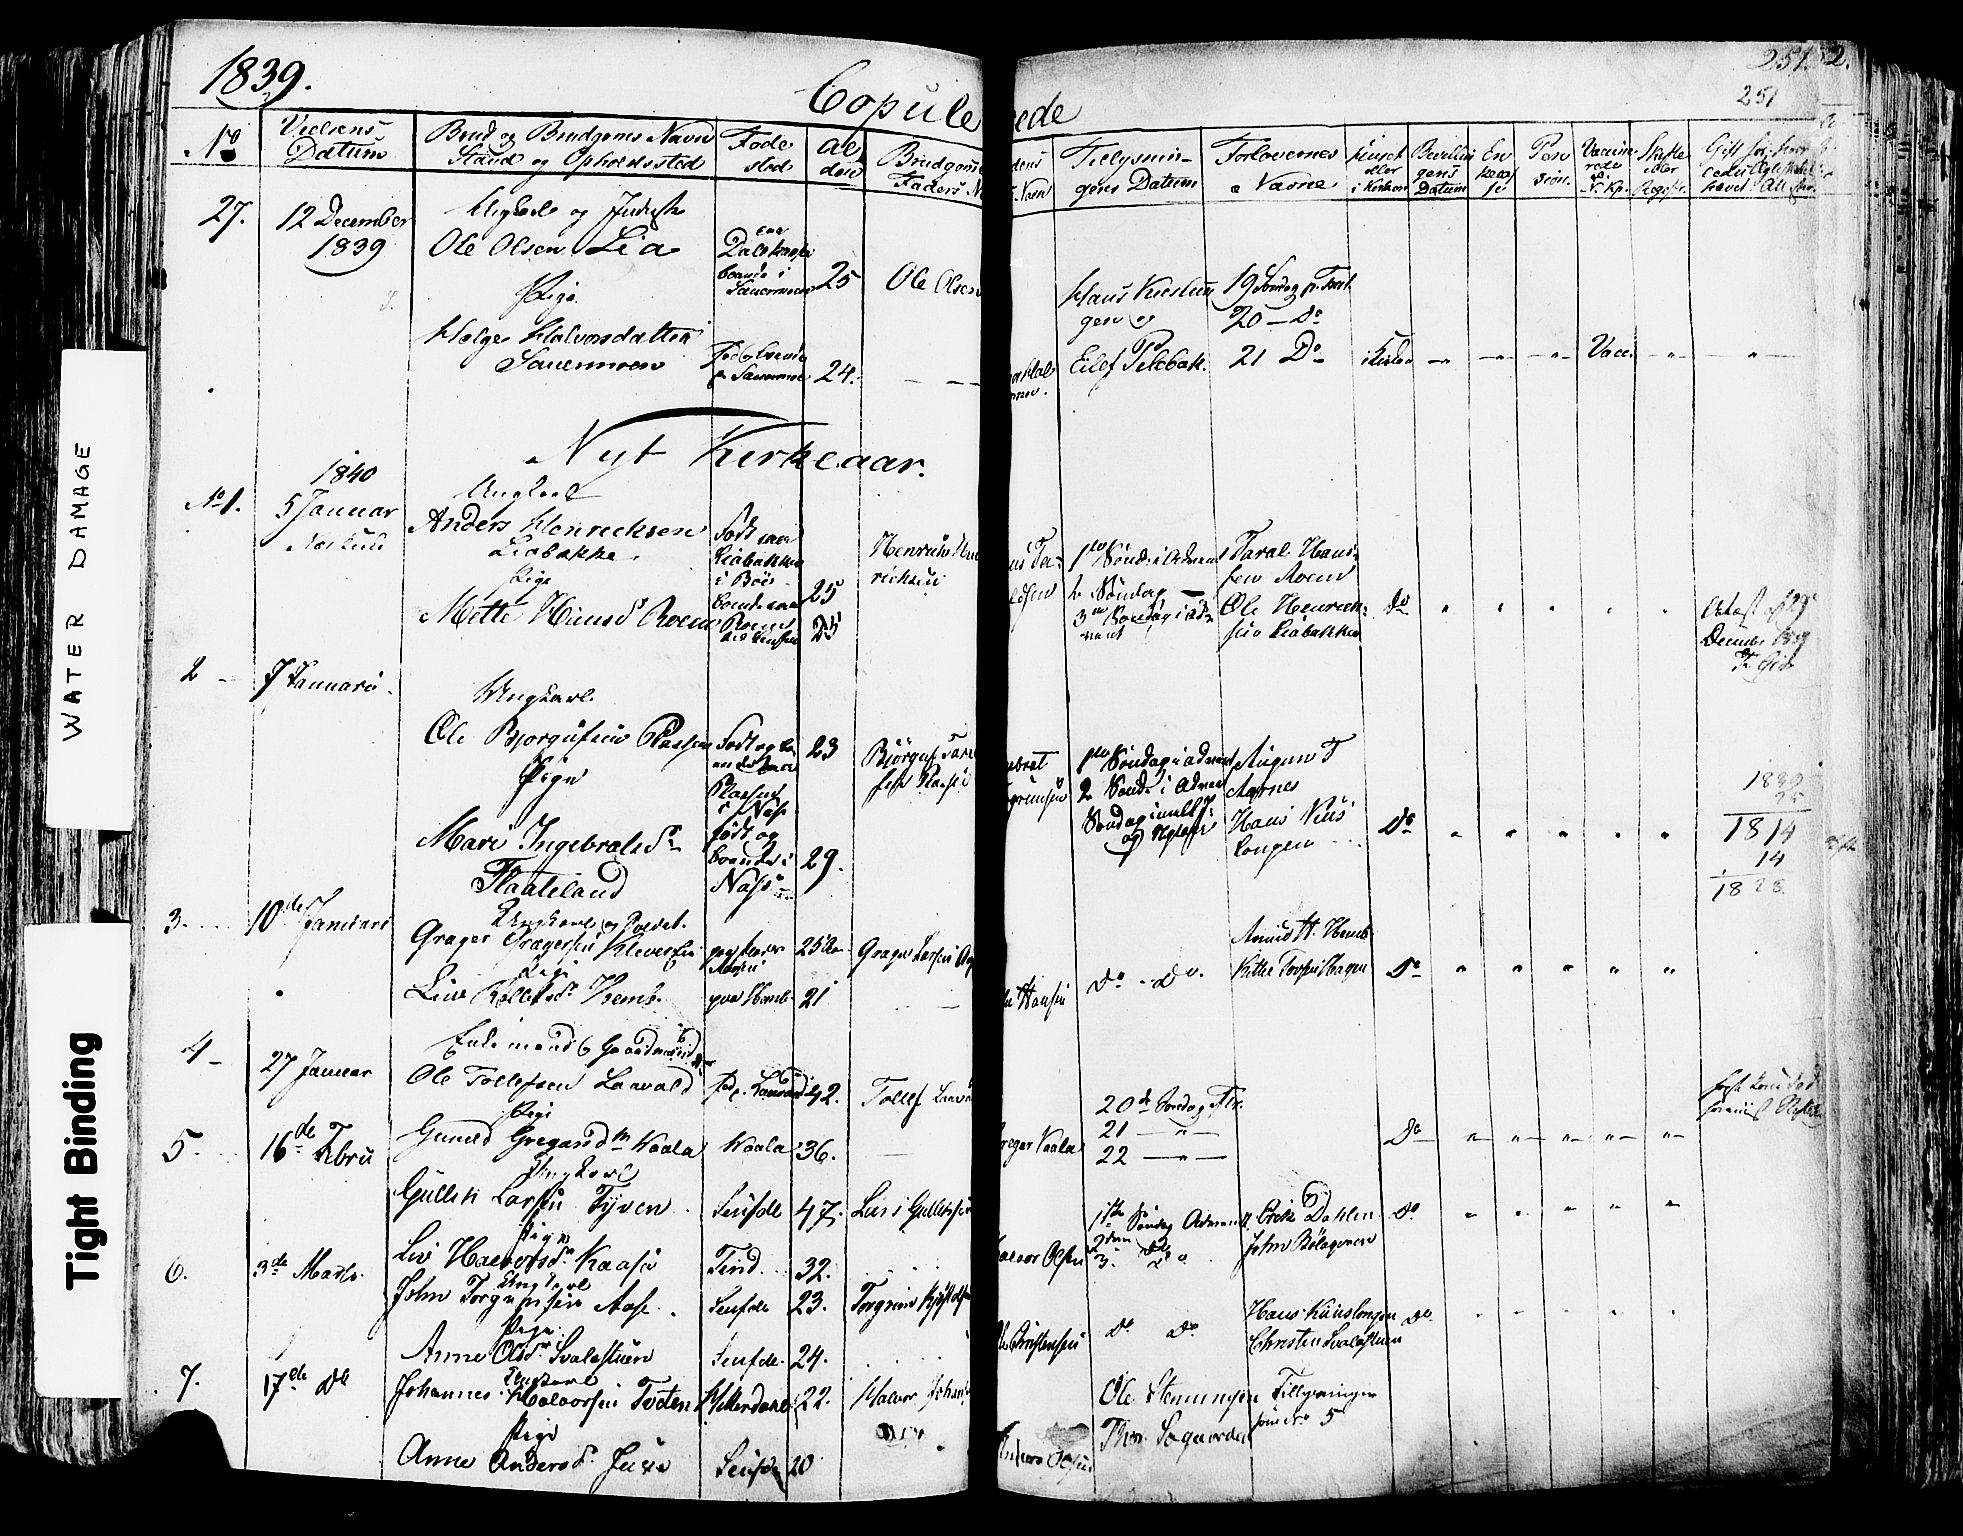 SAKO, Sauherad kirkebøker, F/Fa/L0006: Ministerialbok nr. I 6, 1827-1850, s. 251